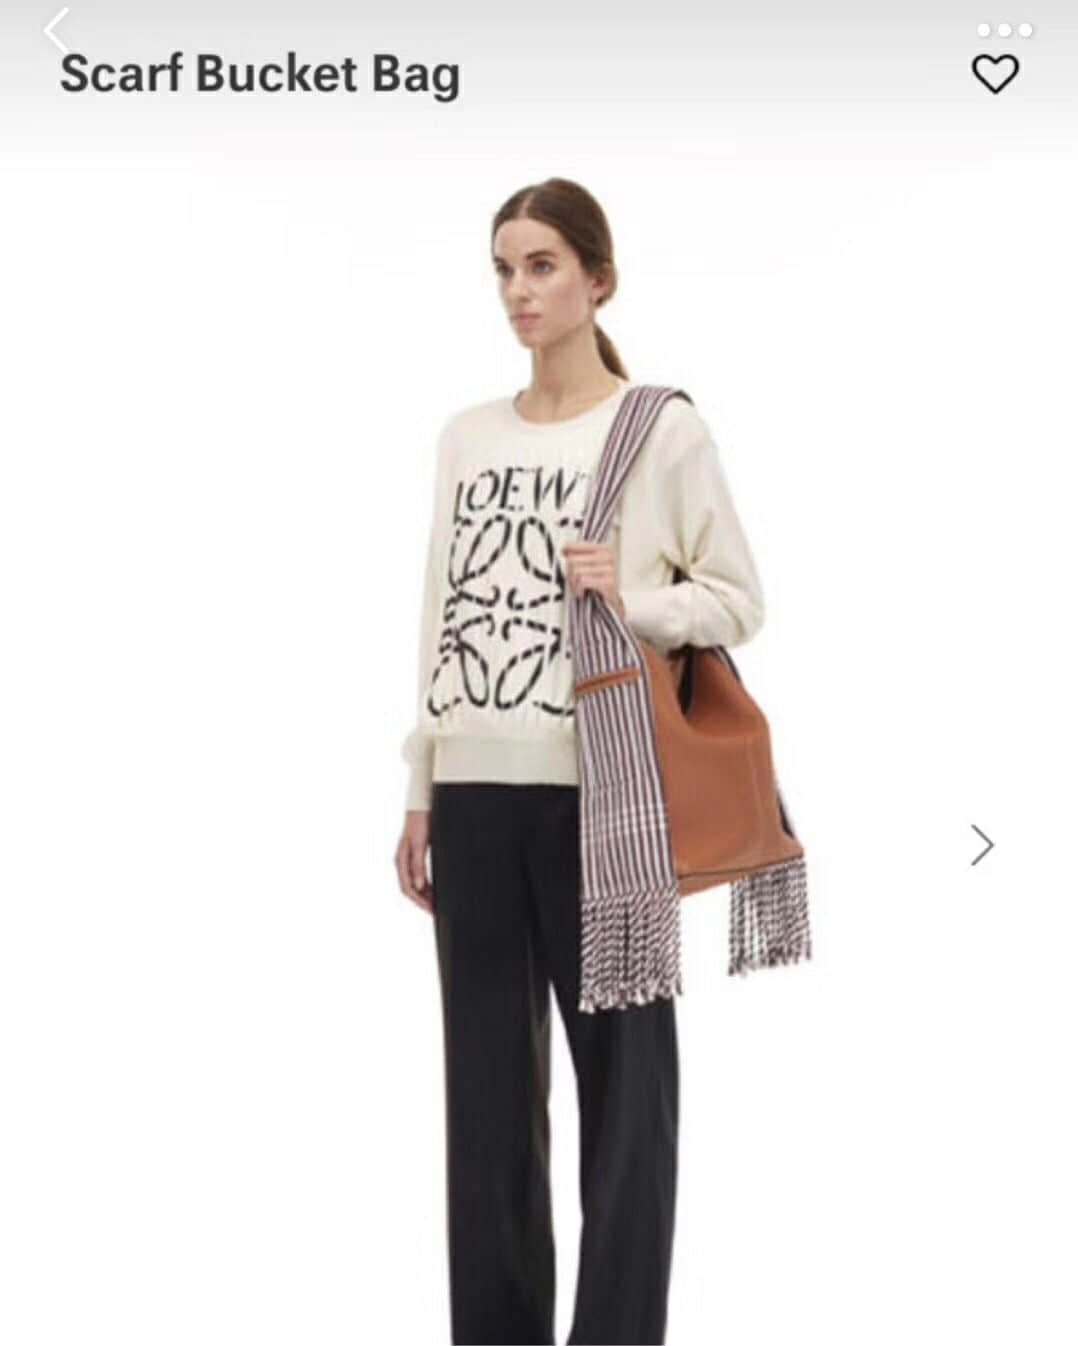 Loewe Scarf Bucket Bag 天后王菲同款斜挎肩包/围巾流浪包